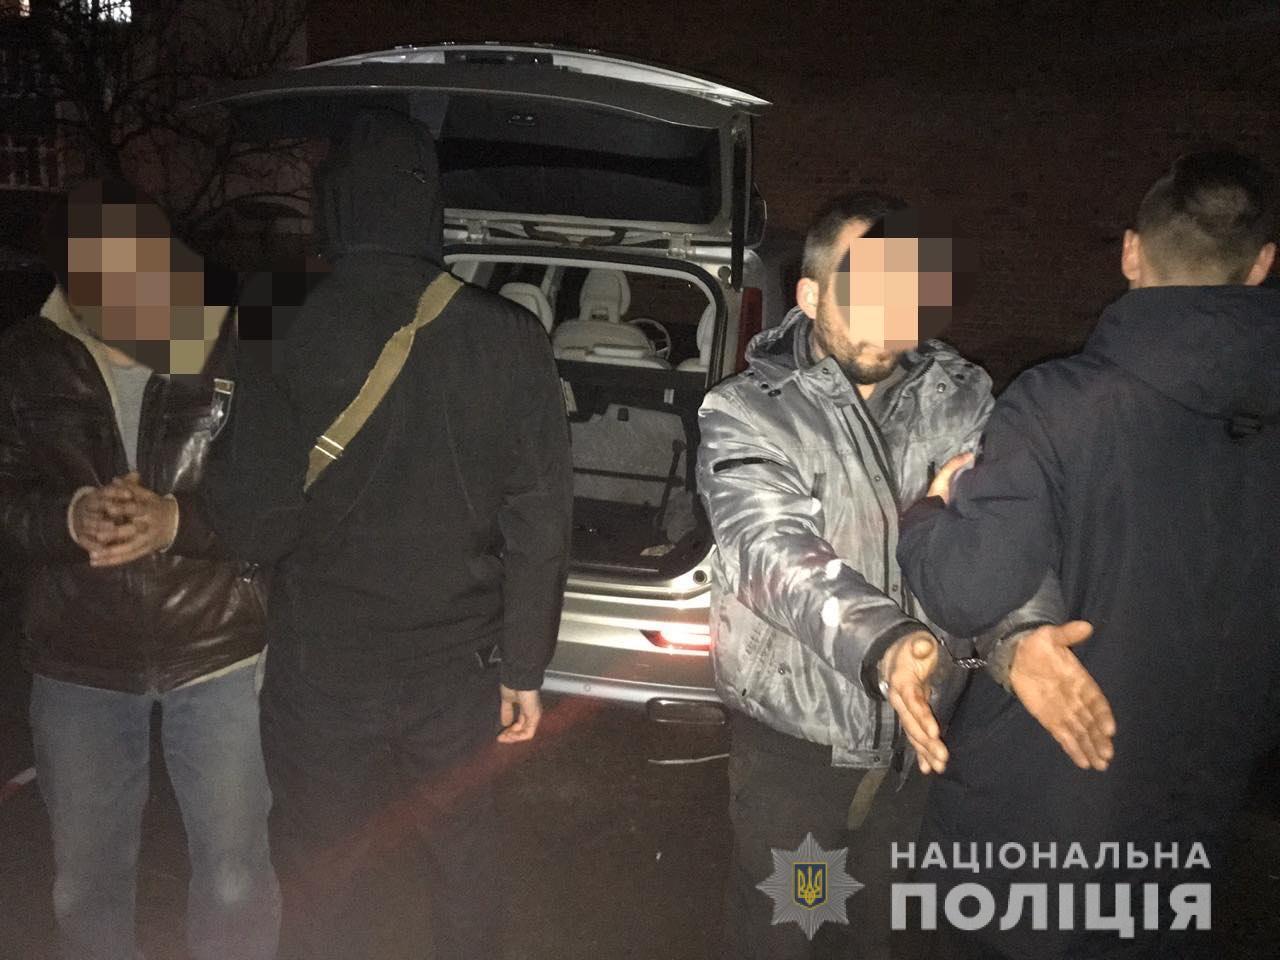 Под Киевом произошла перестрелка: пострадали люди